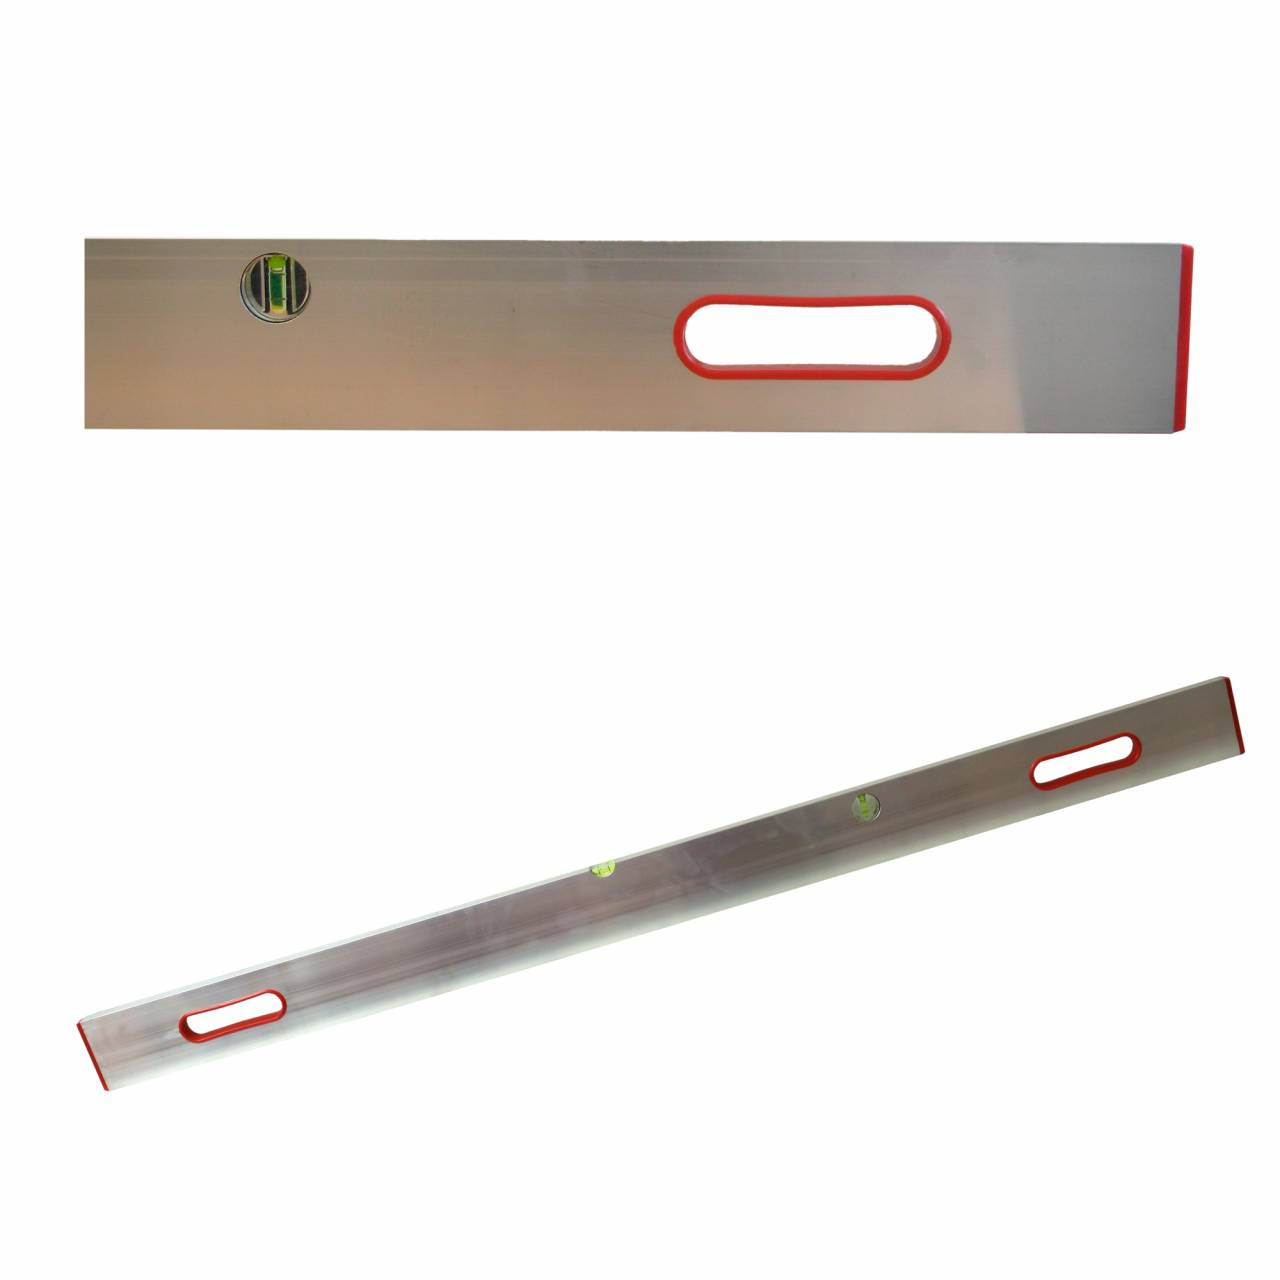 Richt- / Messlatte 300 cm, Aluprofil mit 2 Libellen + 2 Handgriffen